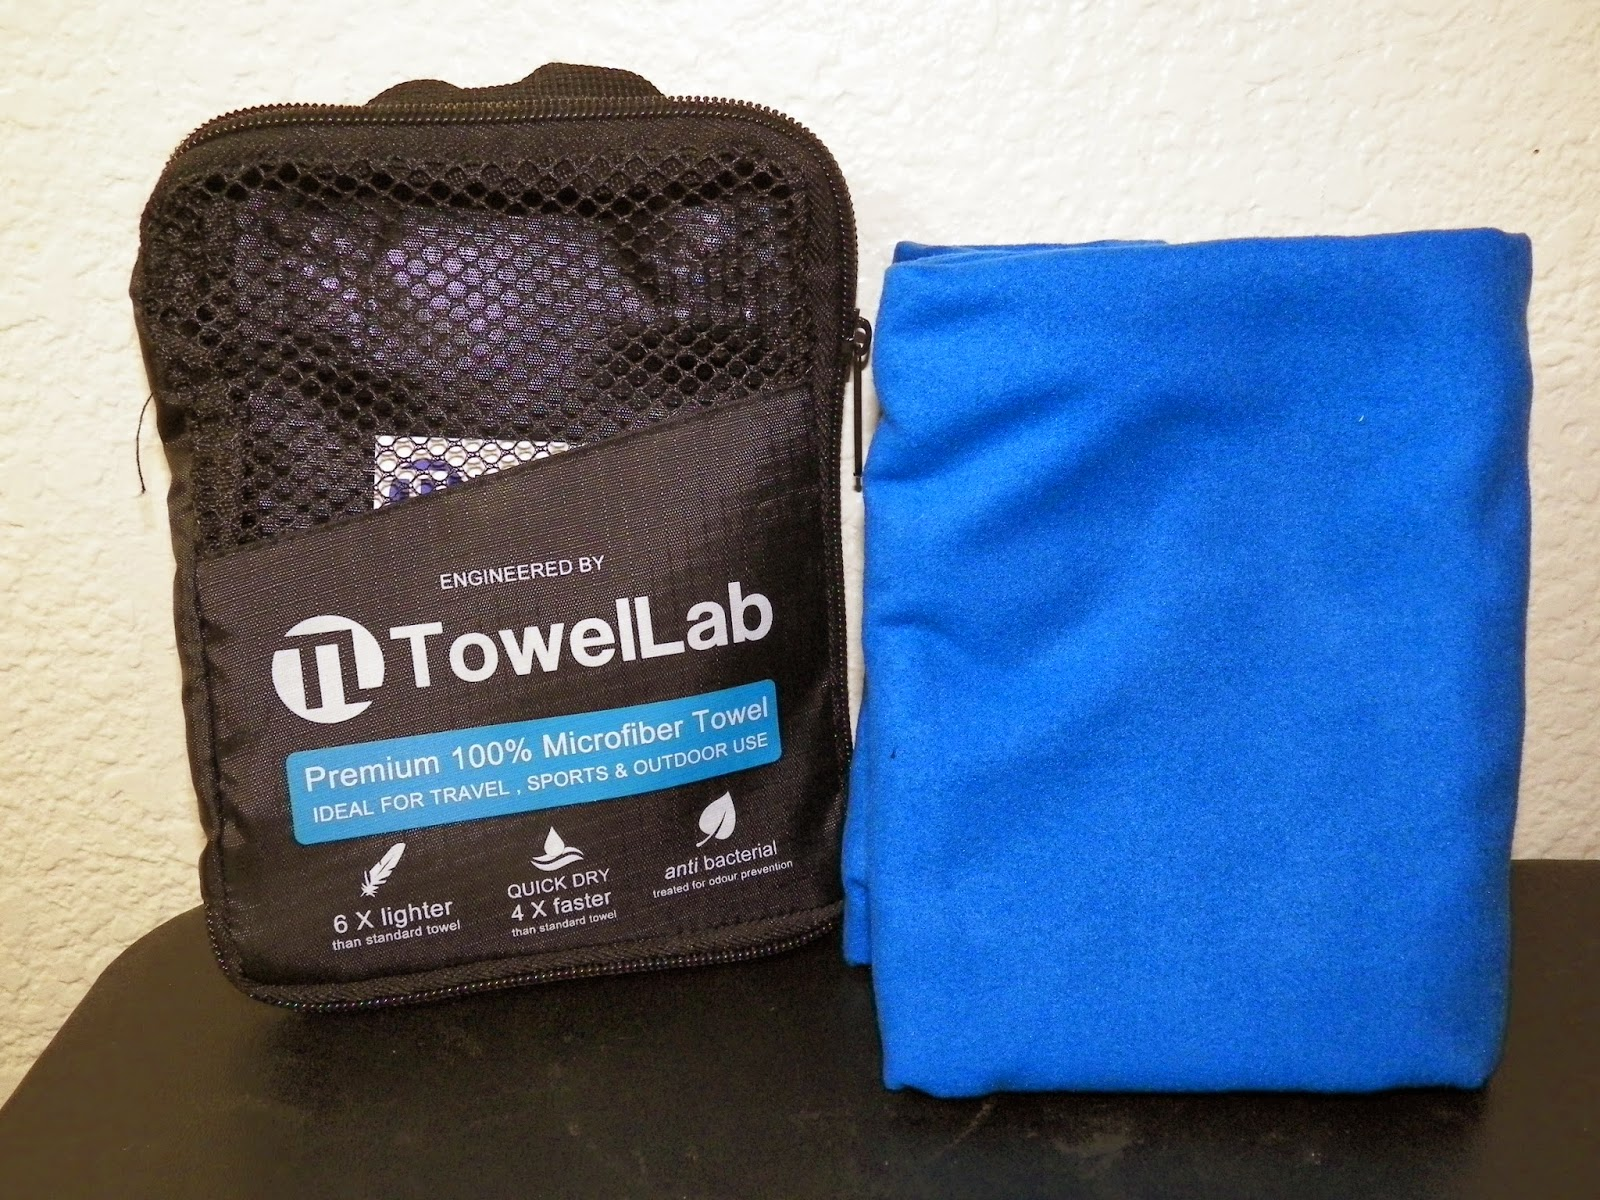 mircofiber travel towel travel gadget